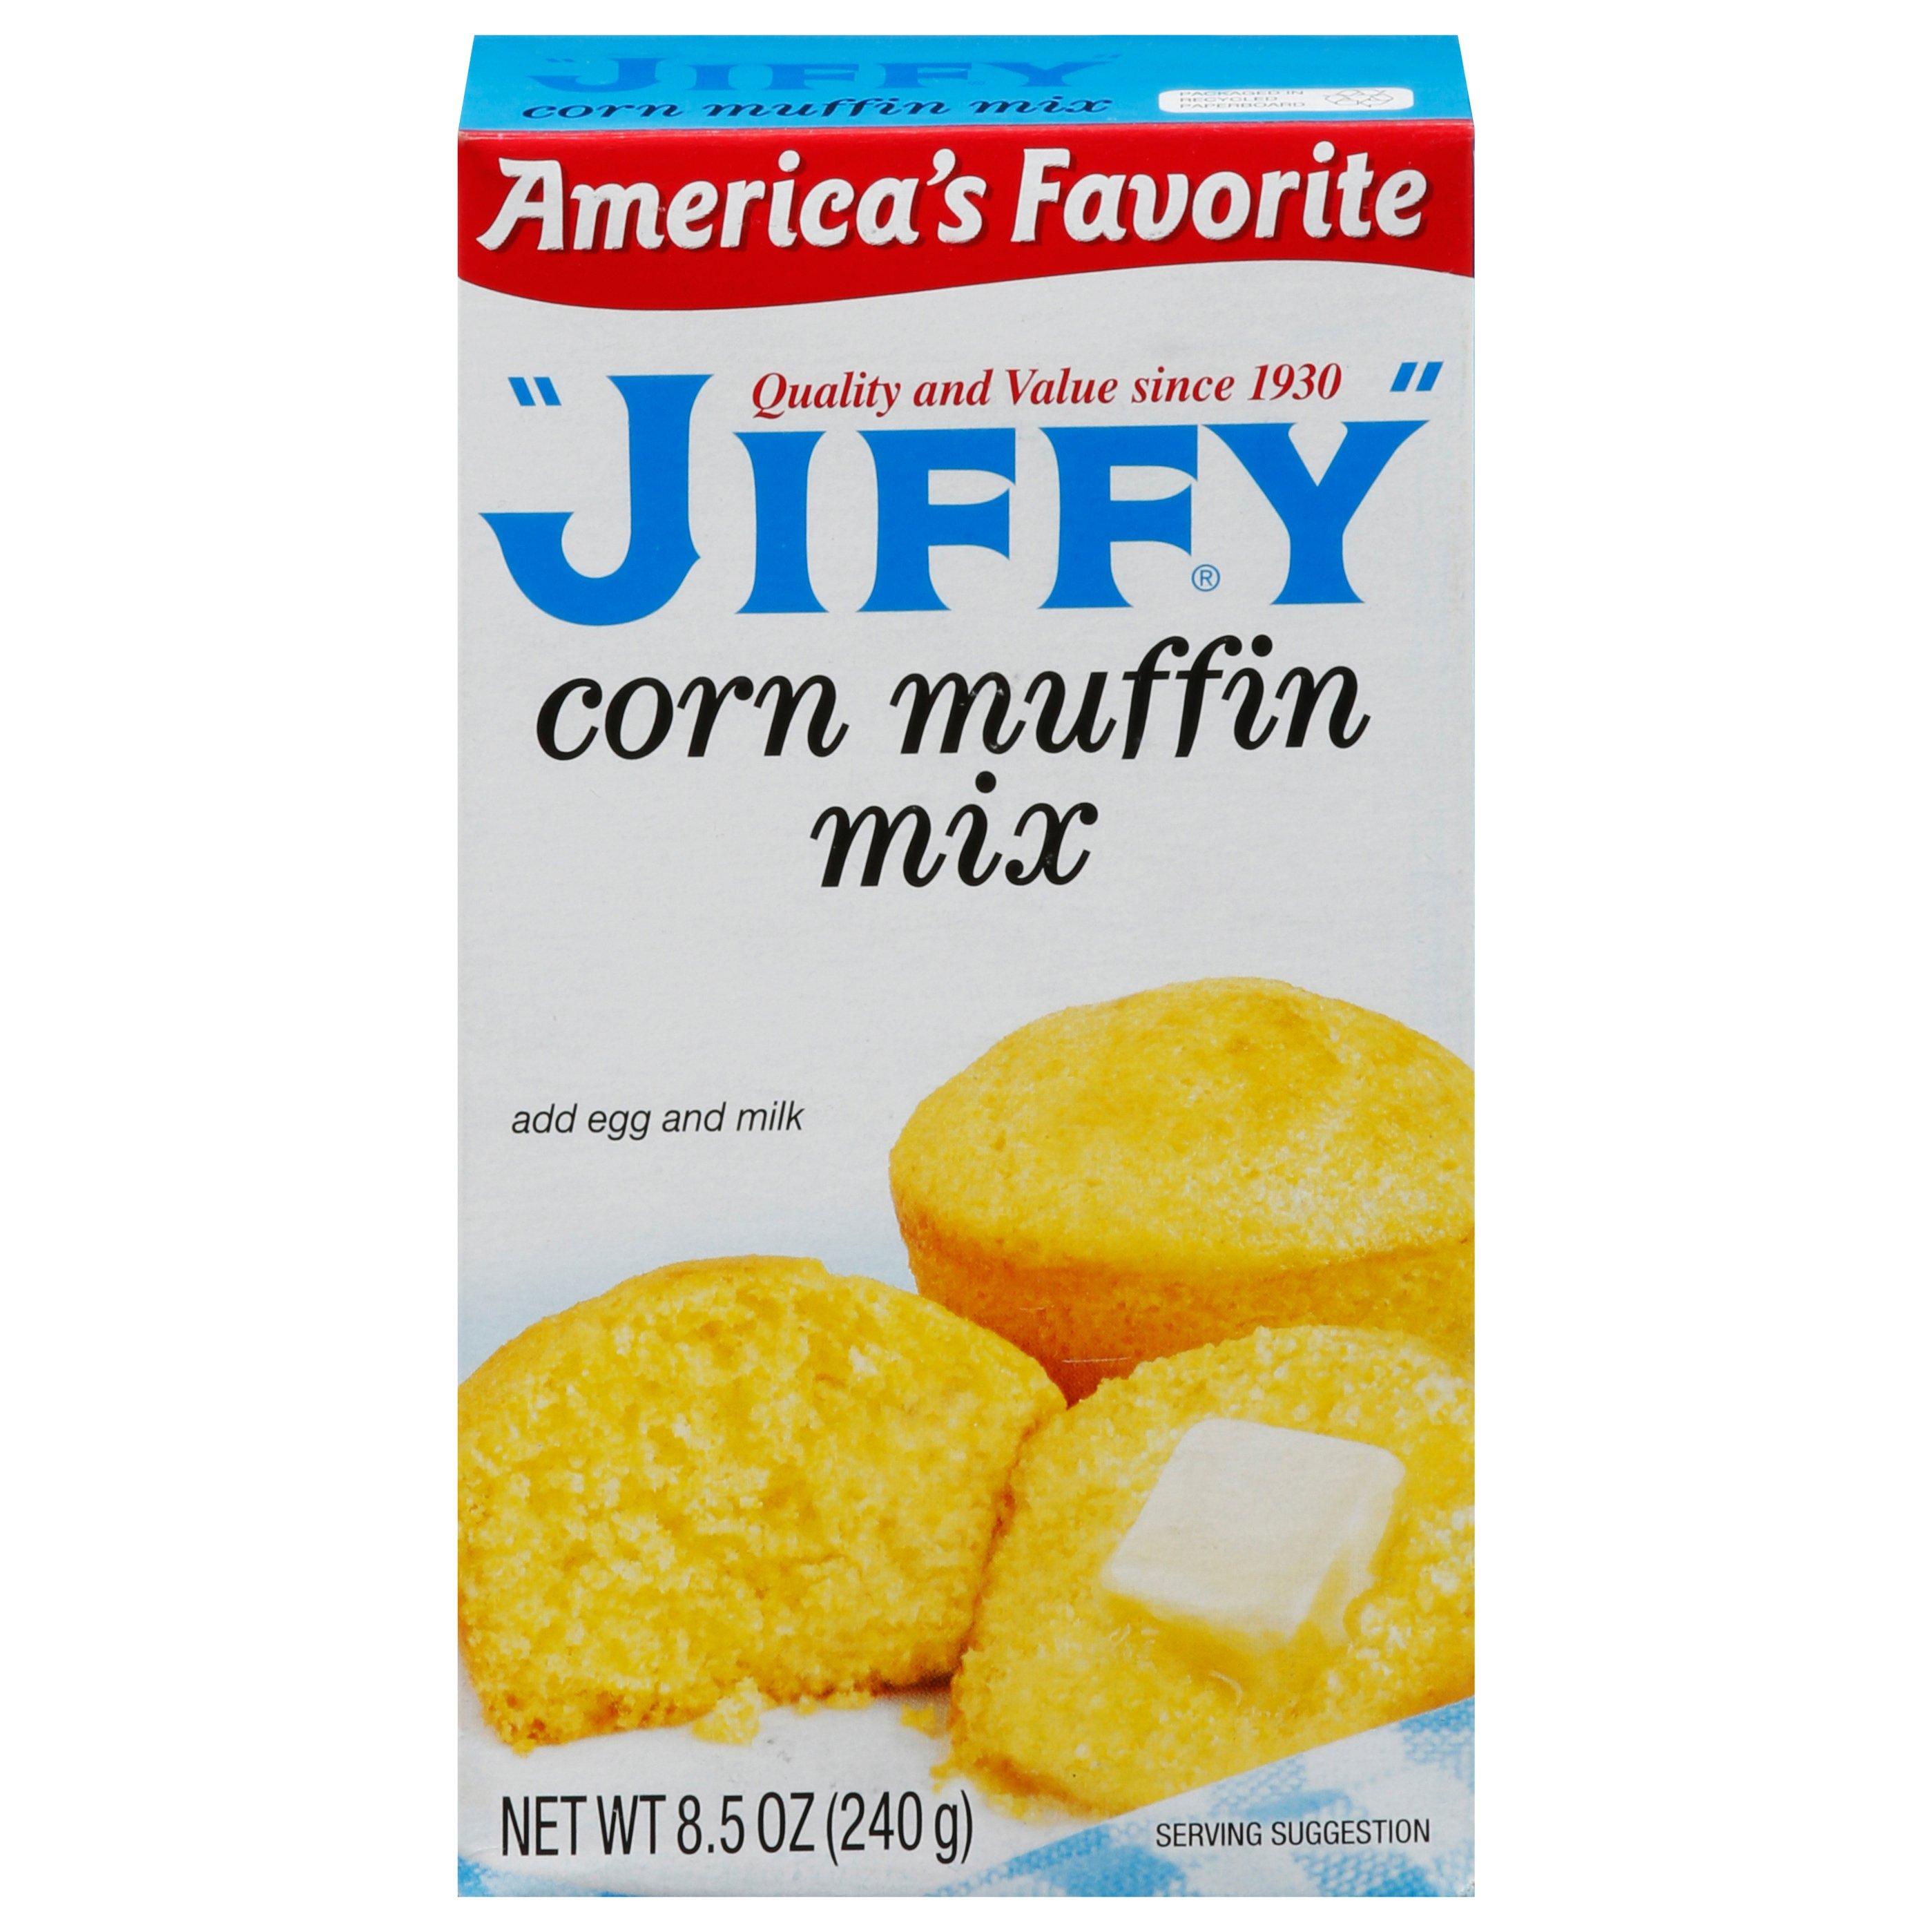 Jiffy Corn Muffin Mix ‑ Shop Baking Mixes at H‑E‑B